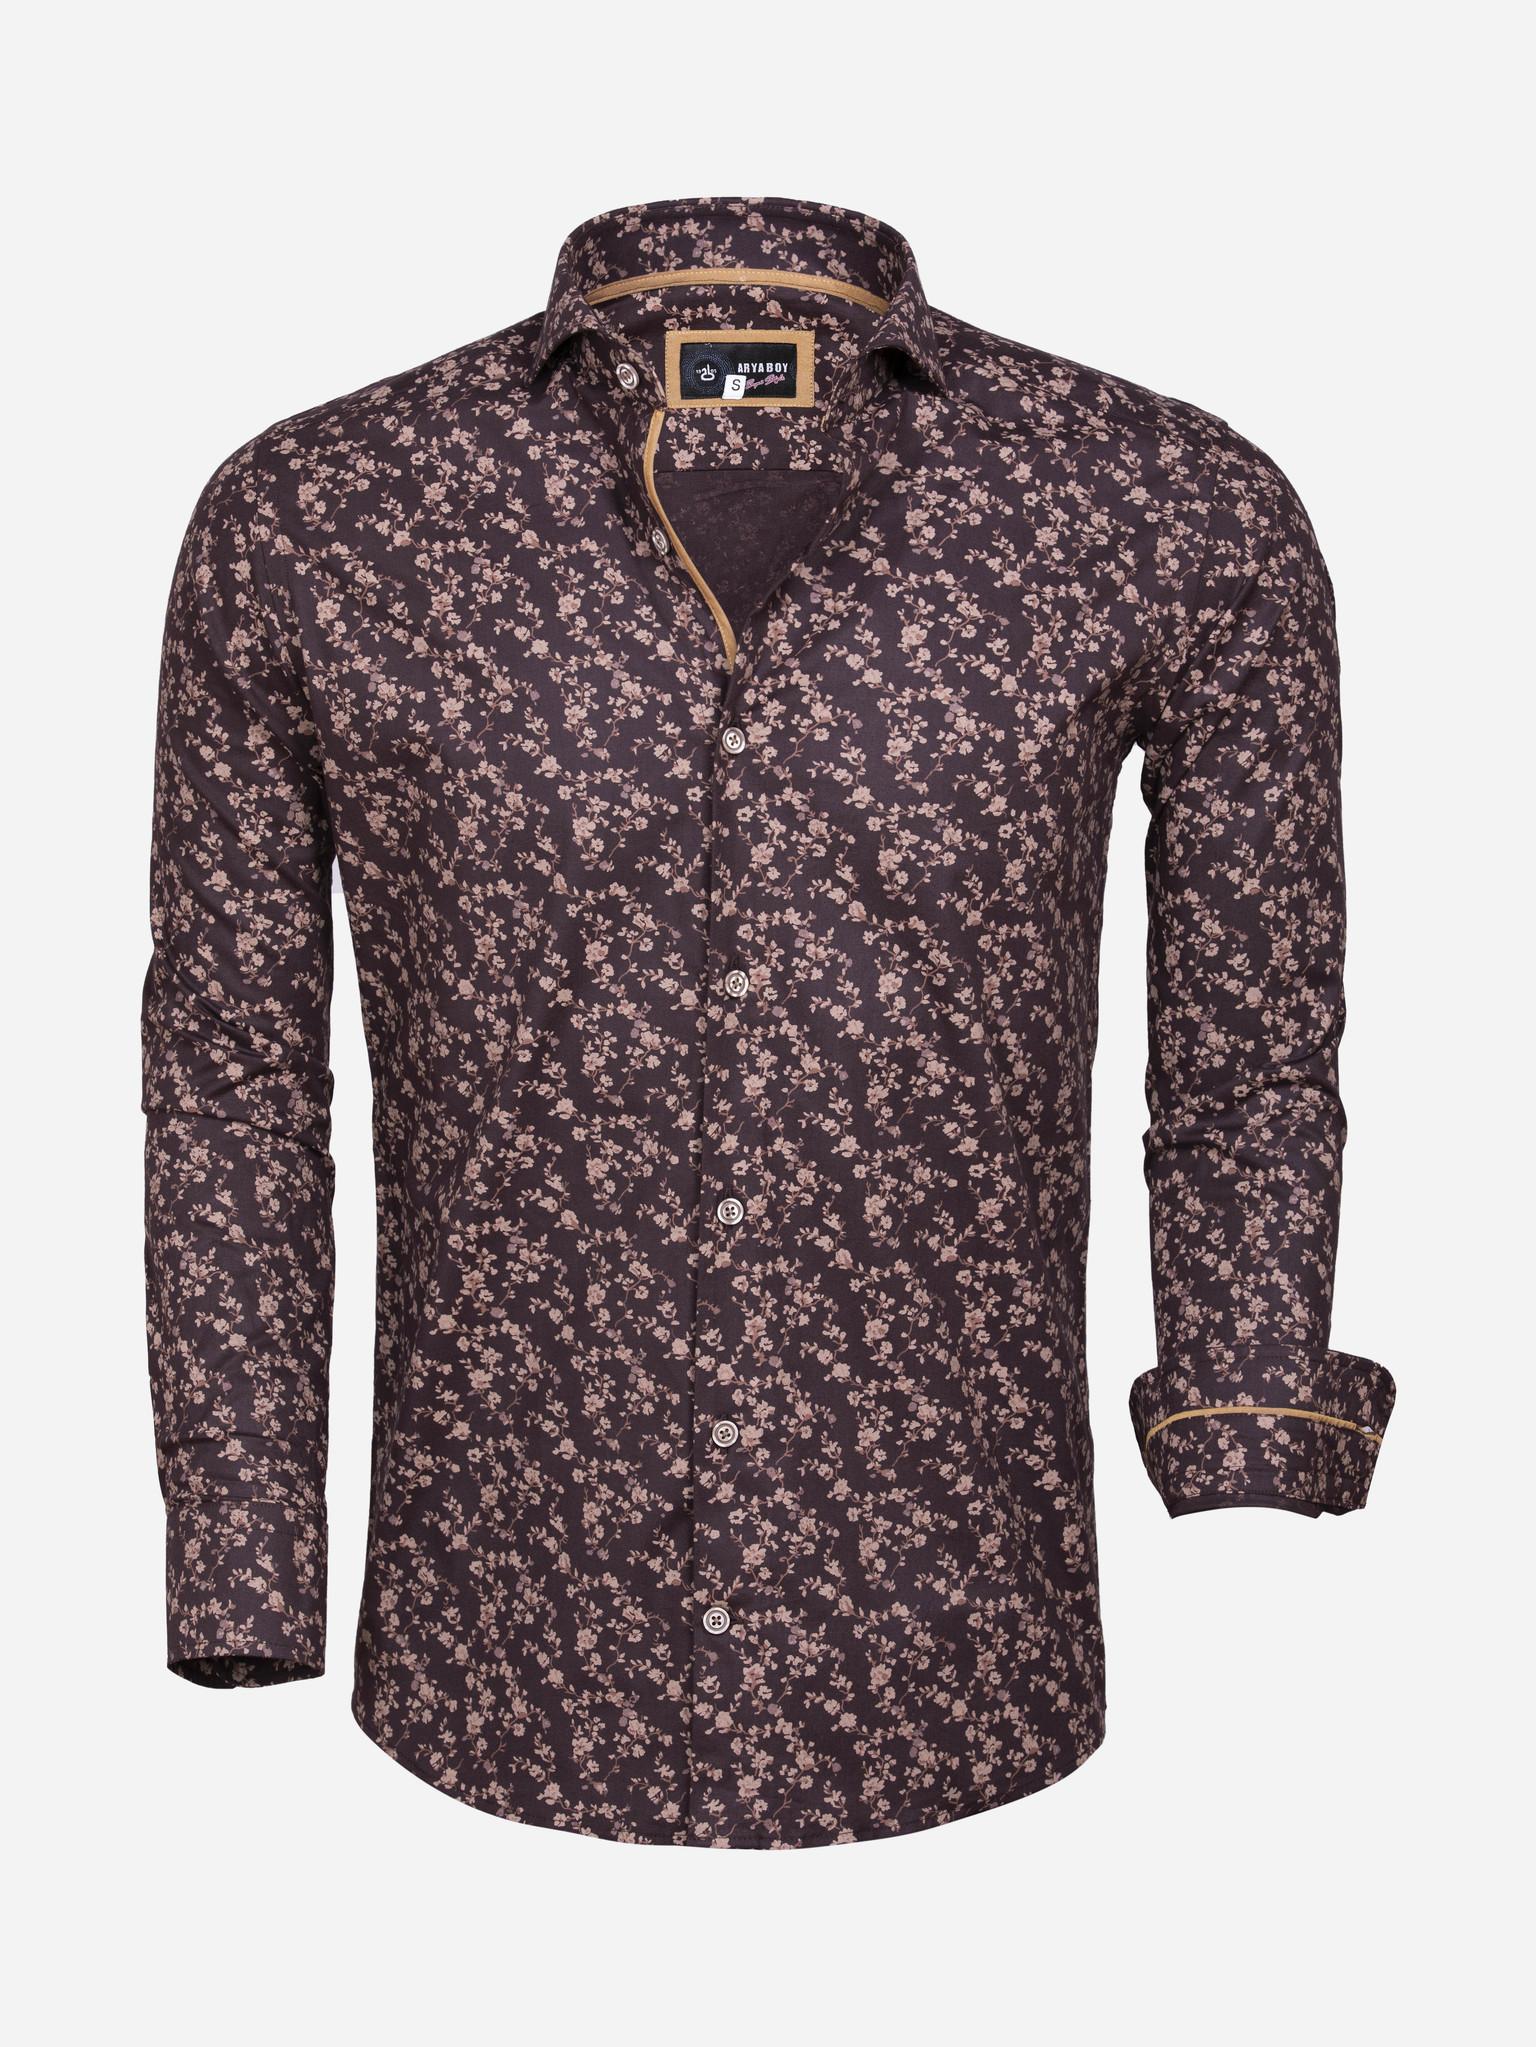 Arya Boy Overhemd Lange Mouw 85281 Brown Maat: L